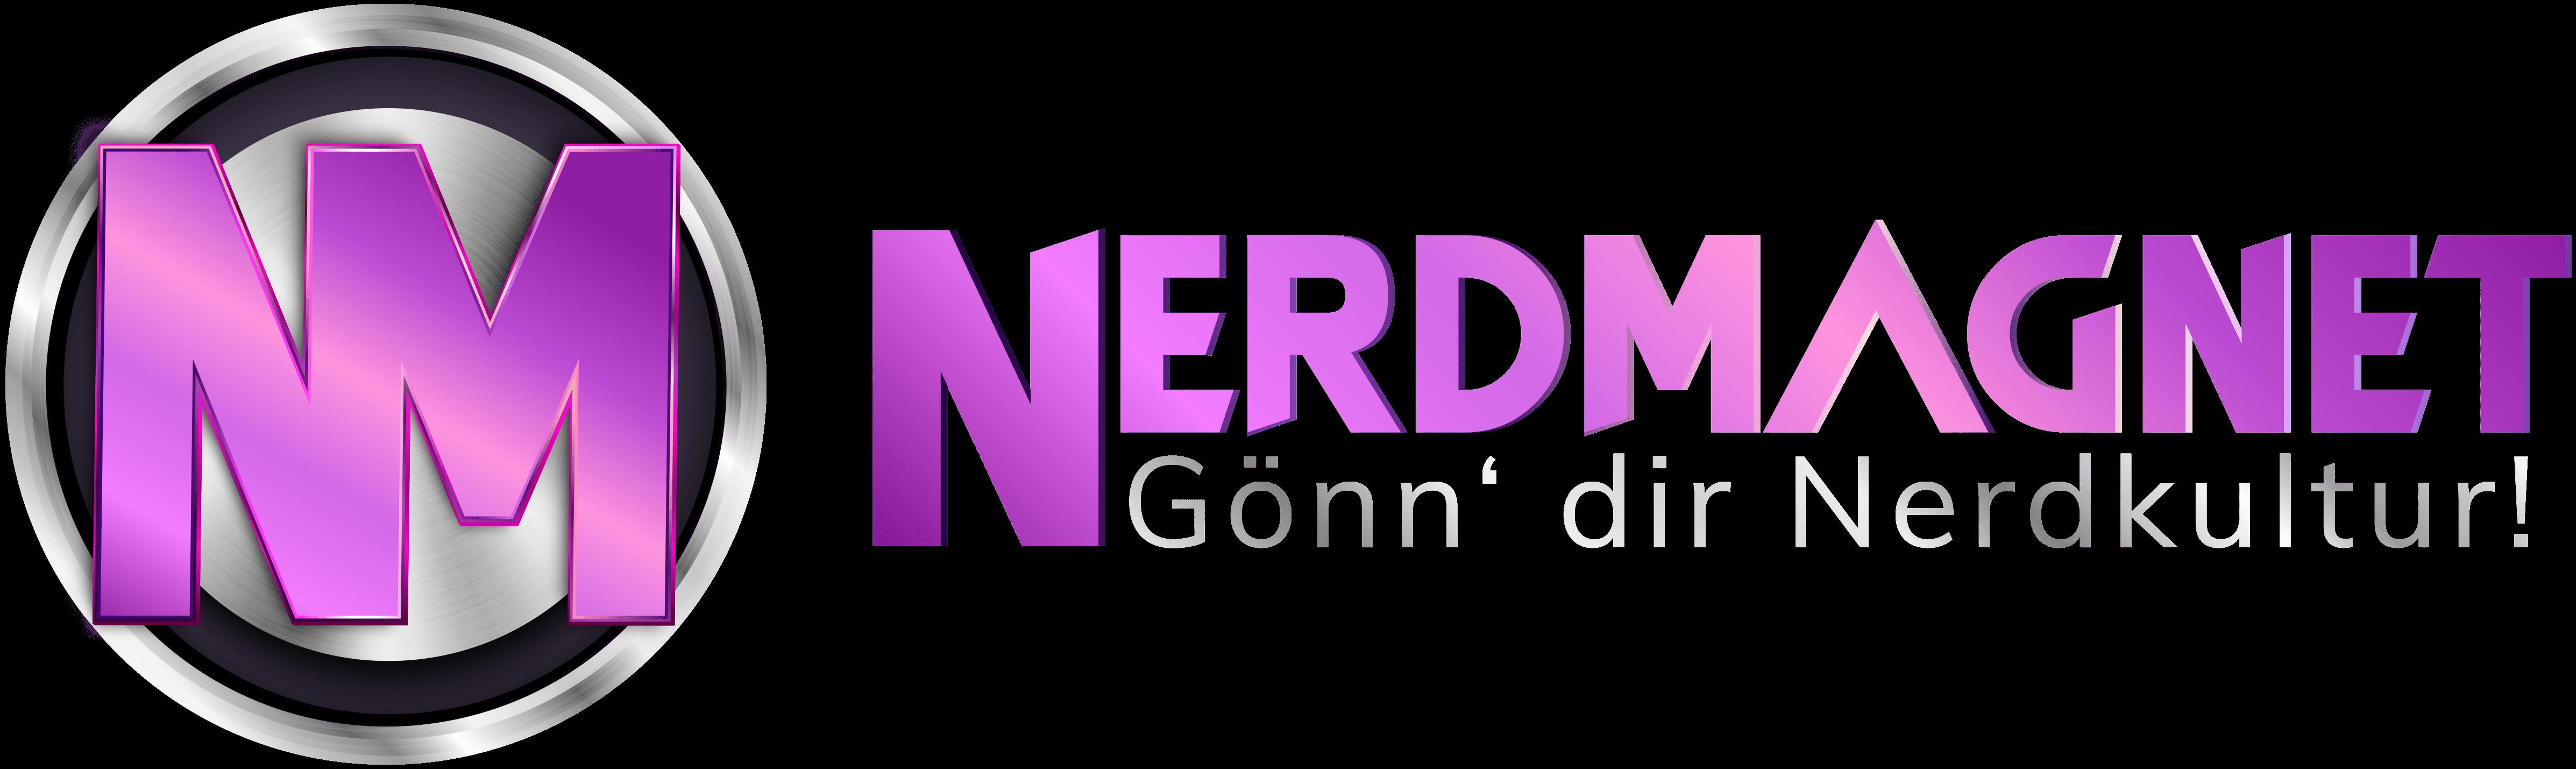 Nerdmagnet